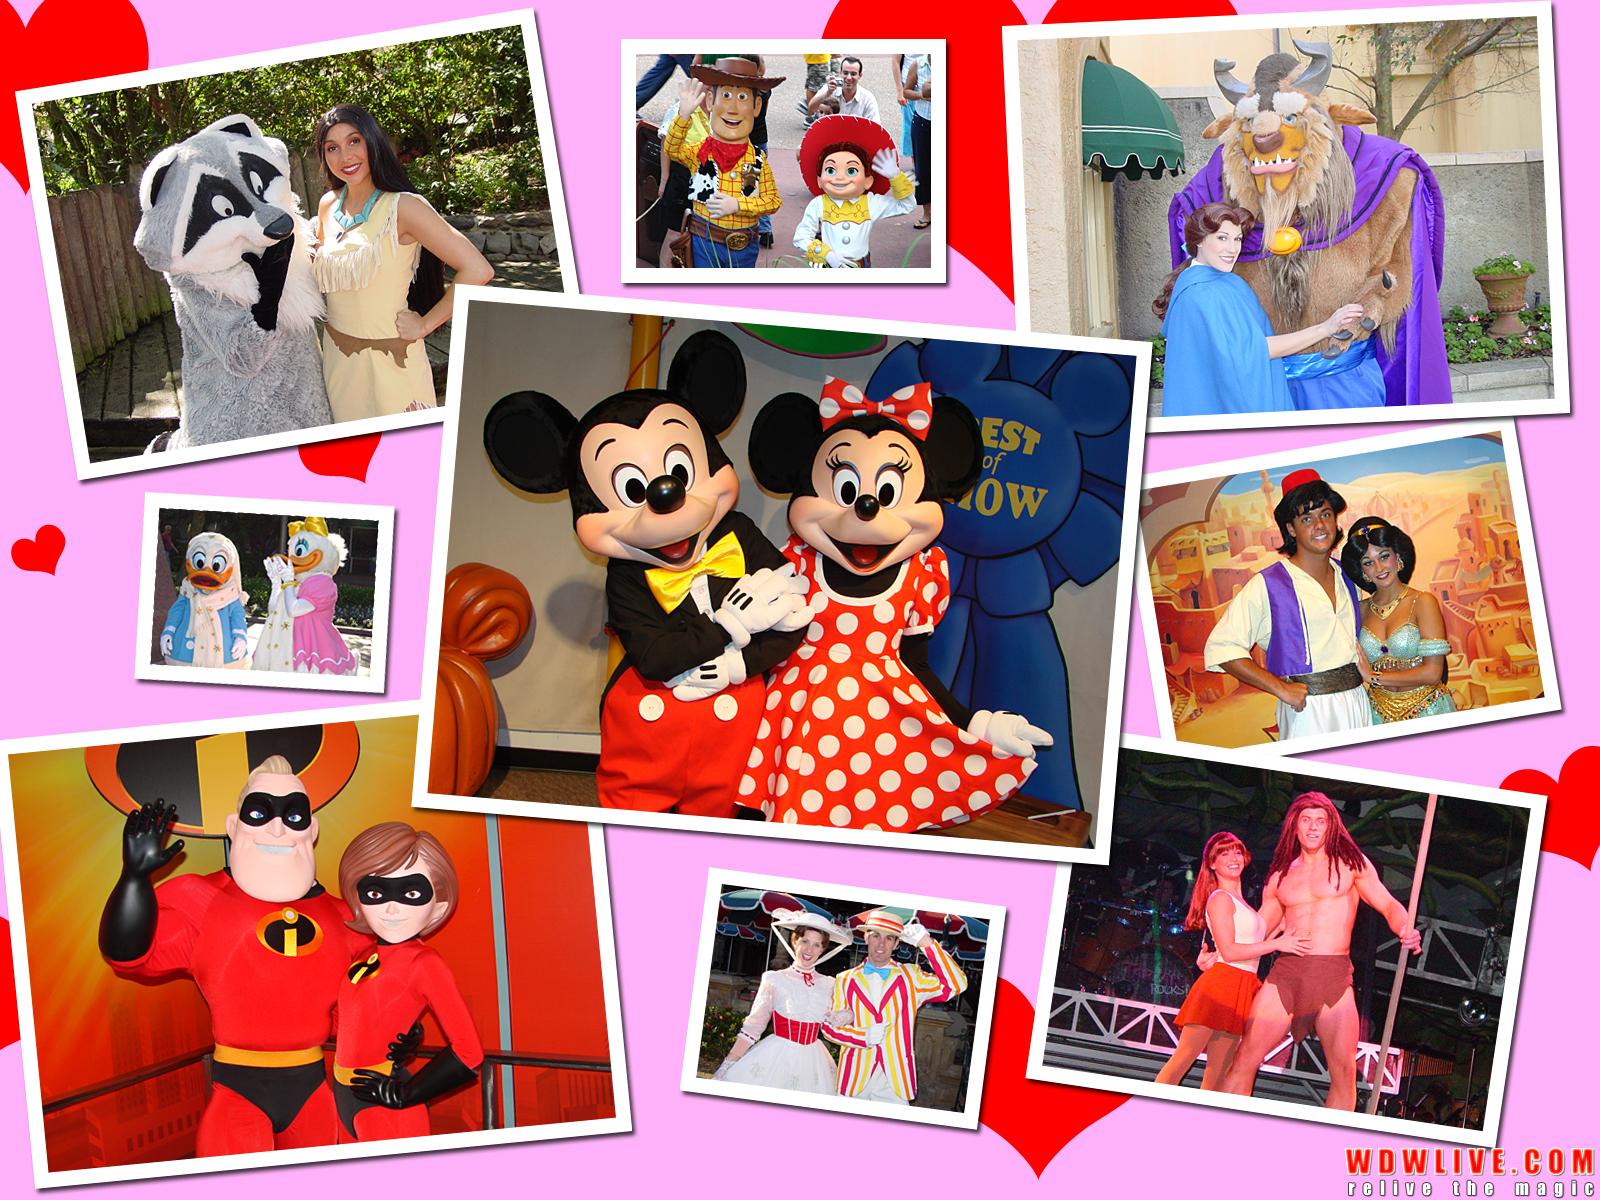 Disney Valentines Wallpaper Disney valenti 1600x1200